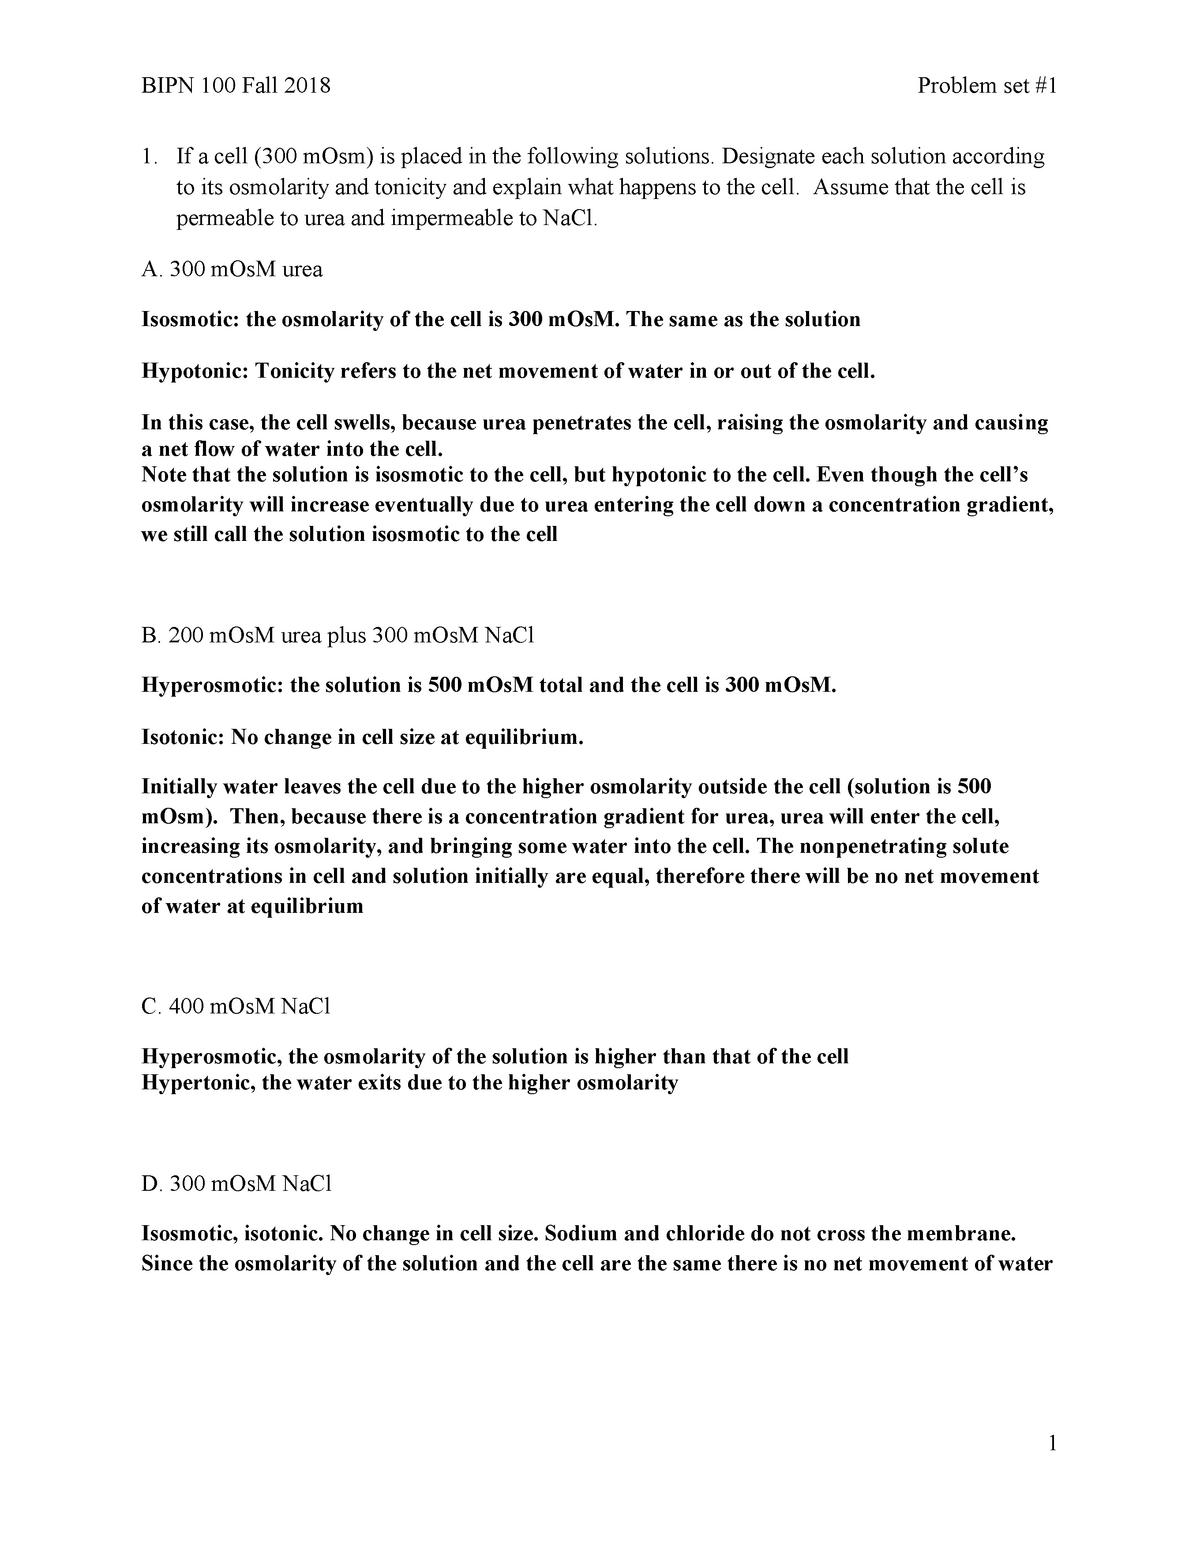 Problem Set 1 solutions - BIPN 100 Human Physiology I - UCSD